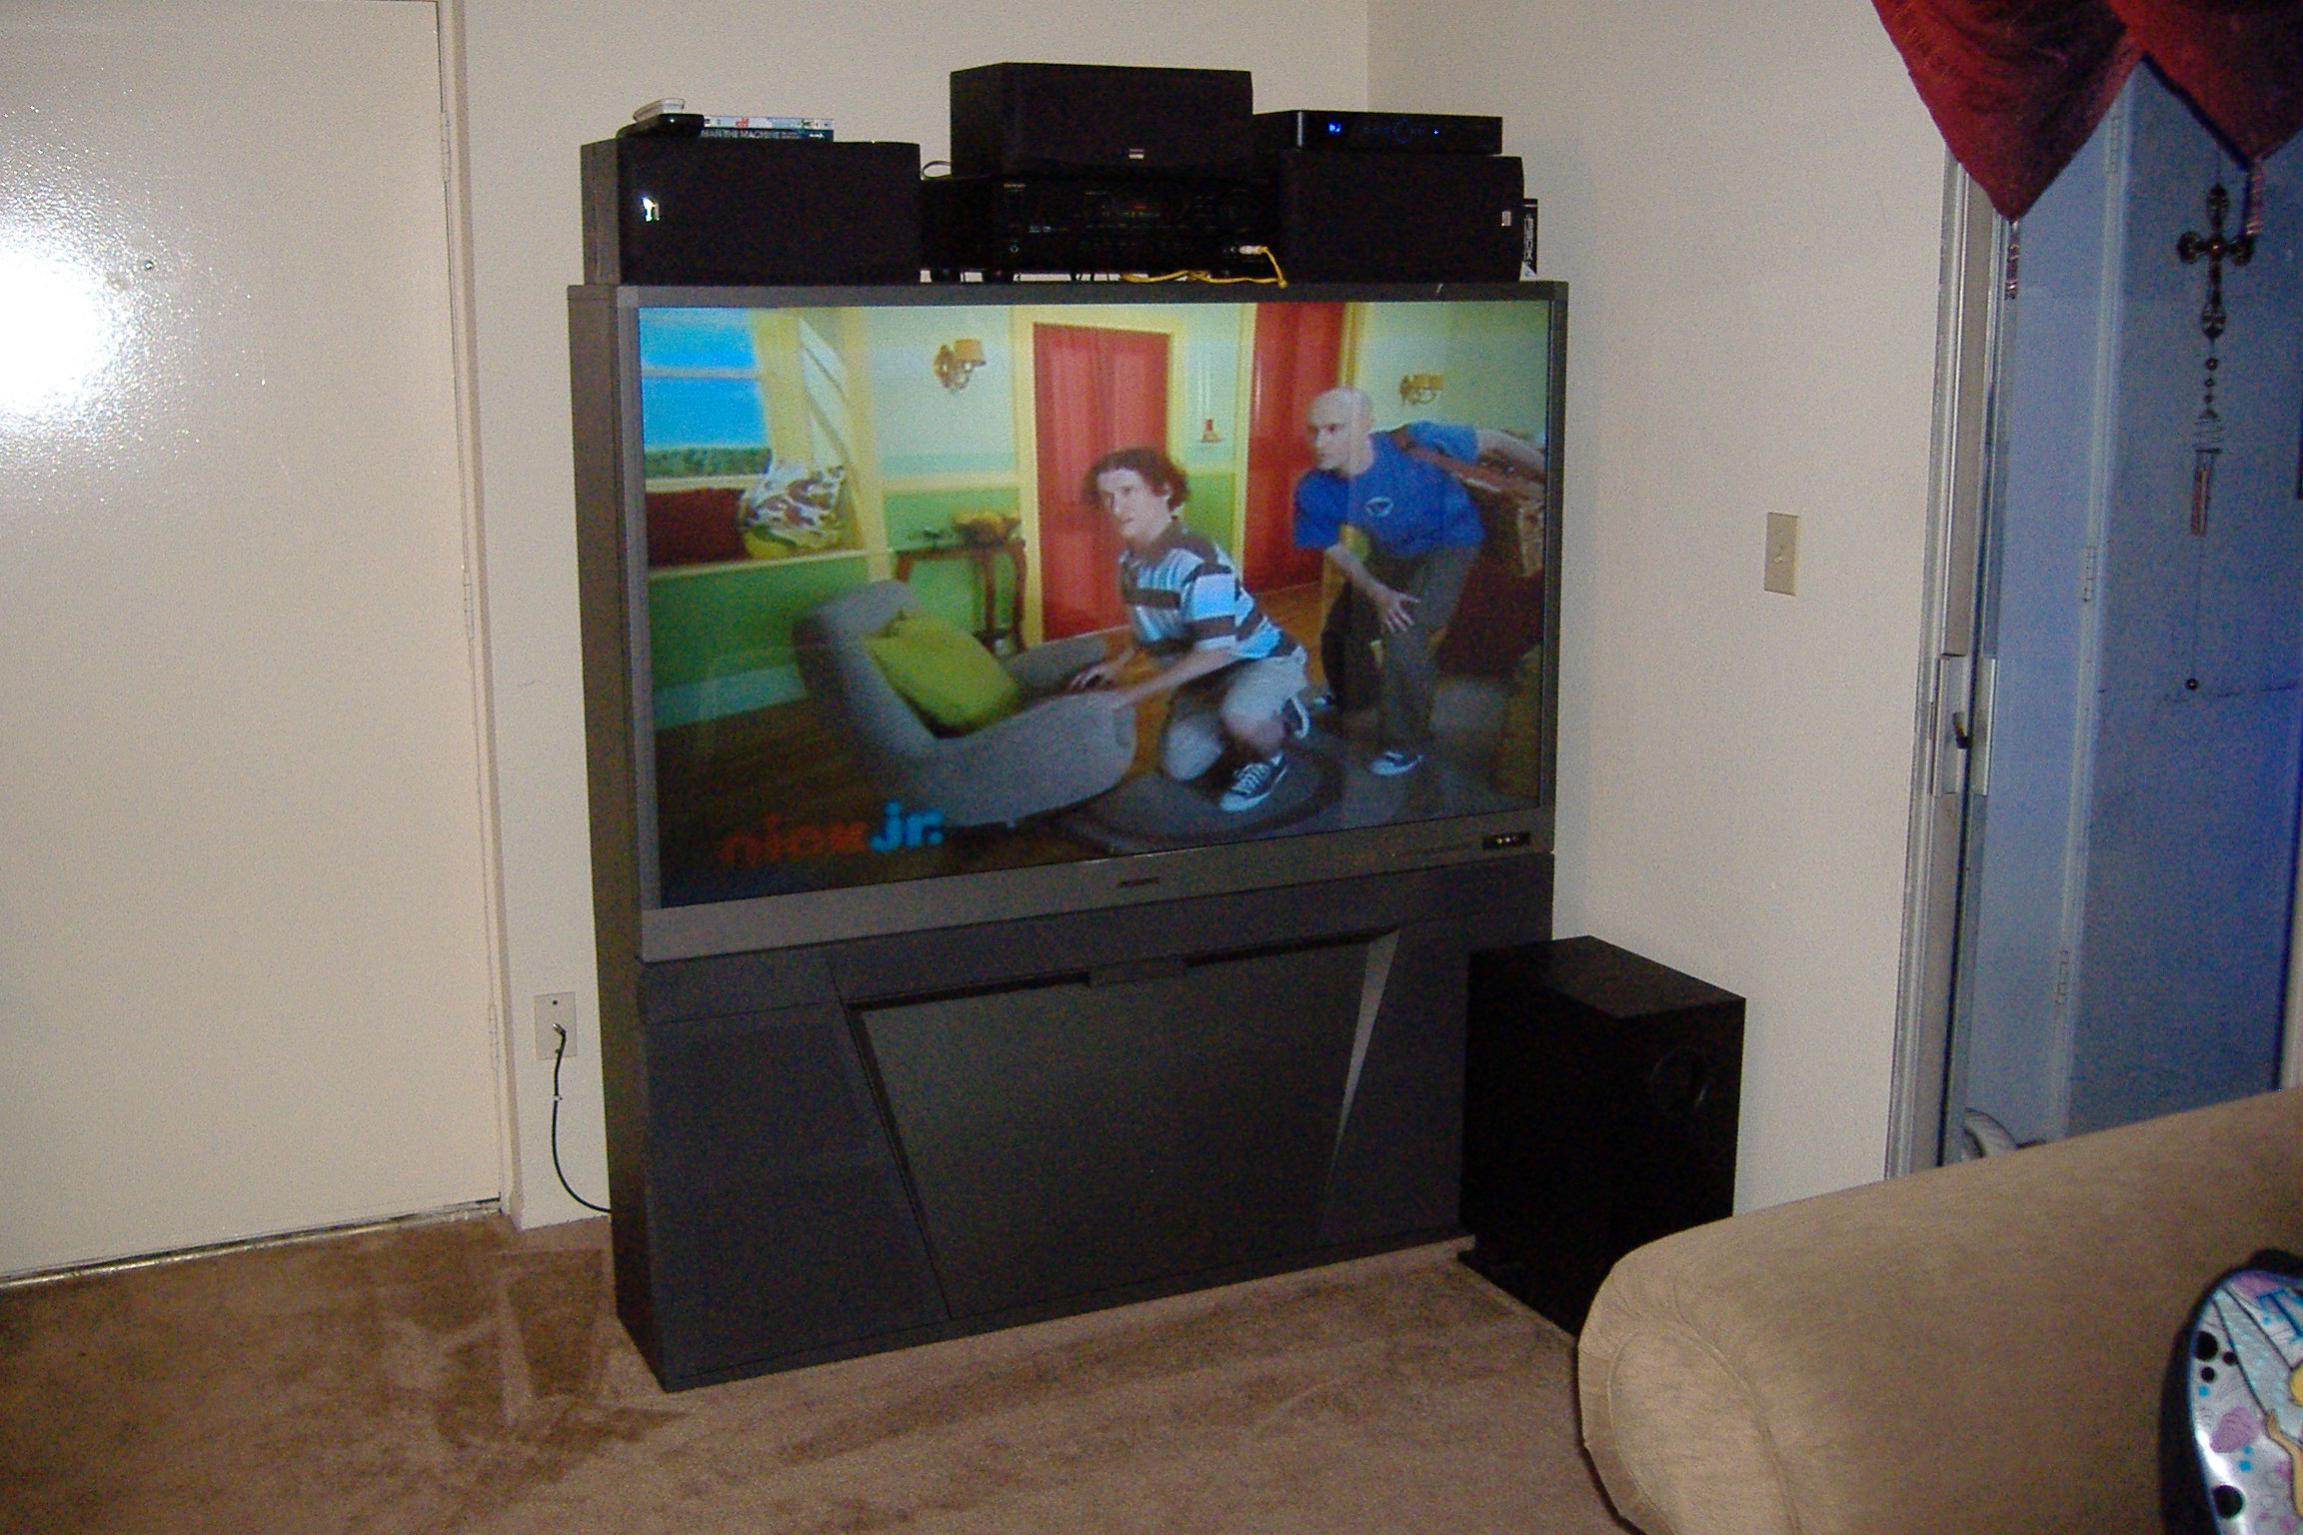 65 Inch Mitsubishi Dlp Type Television - Best Hawaiian Deals